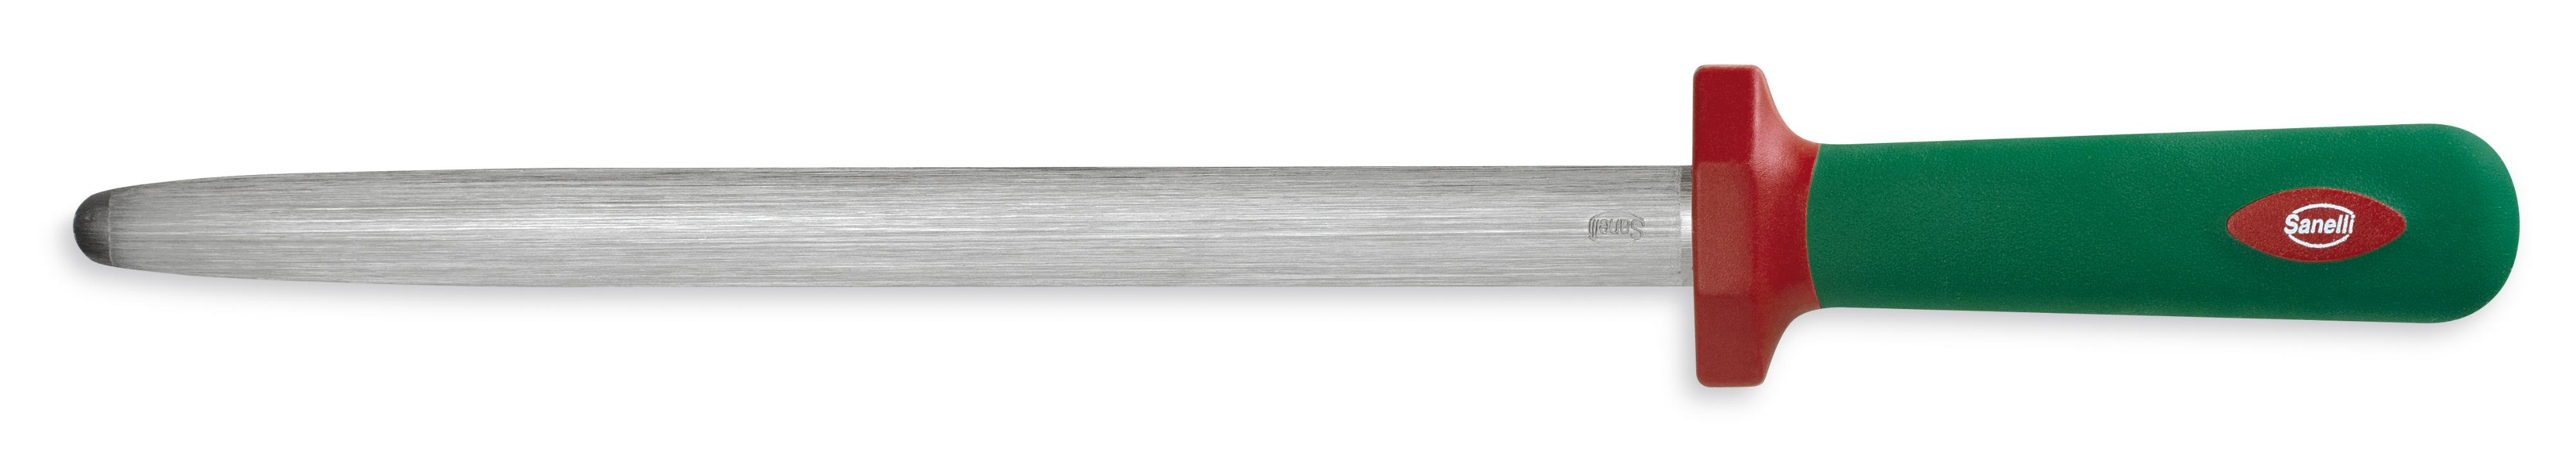 30cm//11.81 Sanelli Premana Professional Sharpening Steel Green